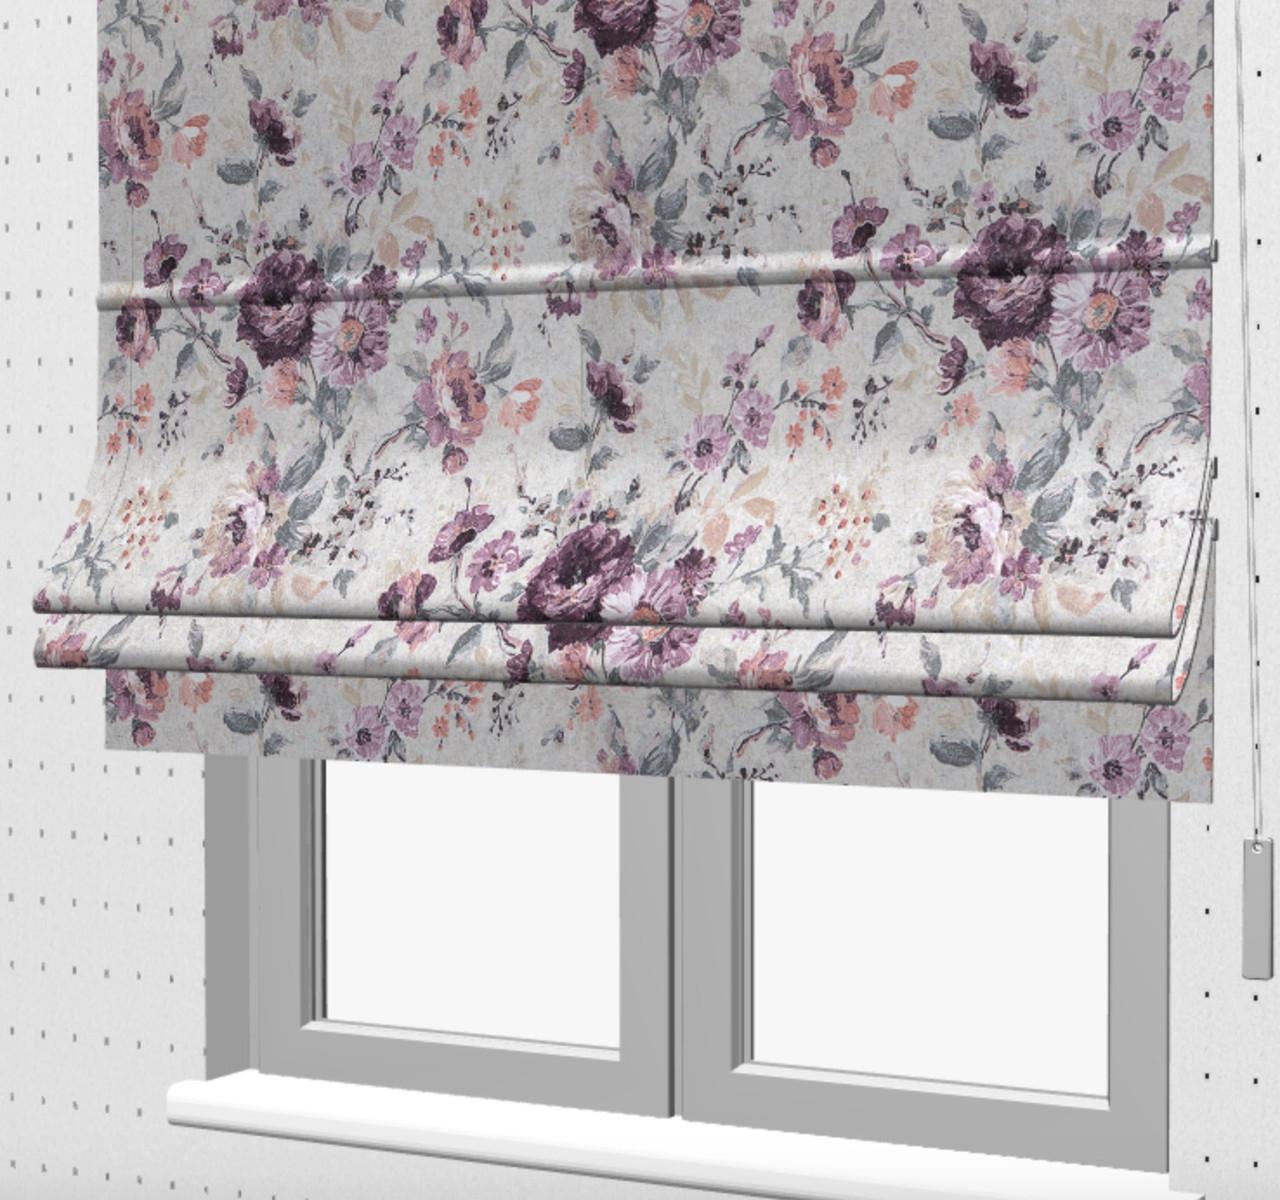 Римська штора для кухні 400257v2